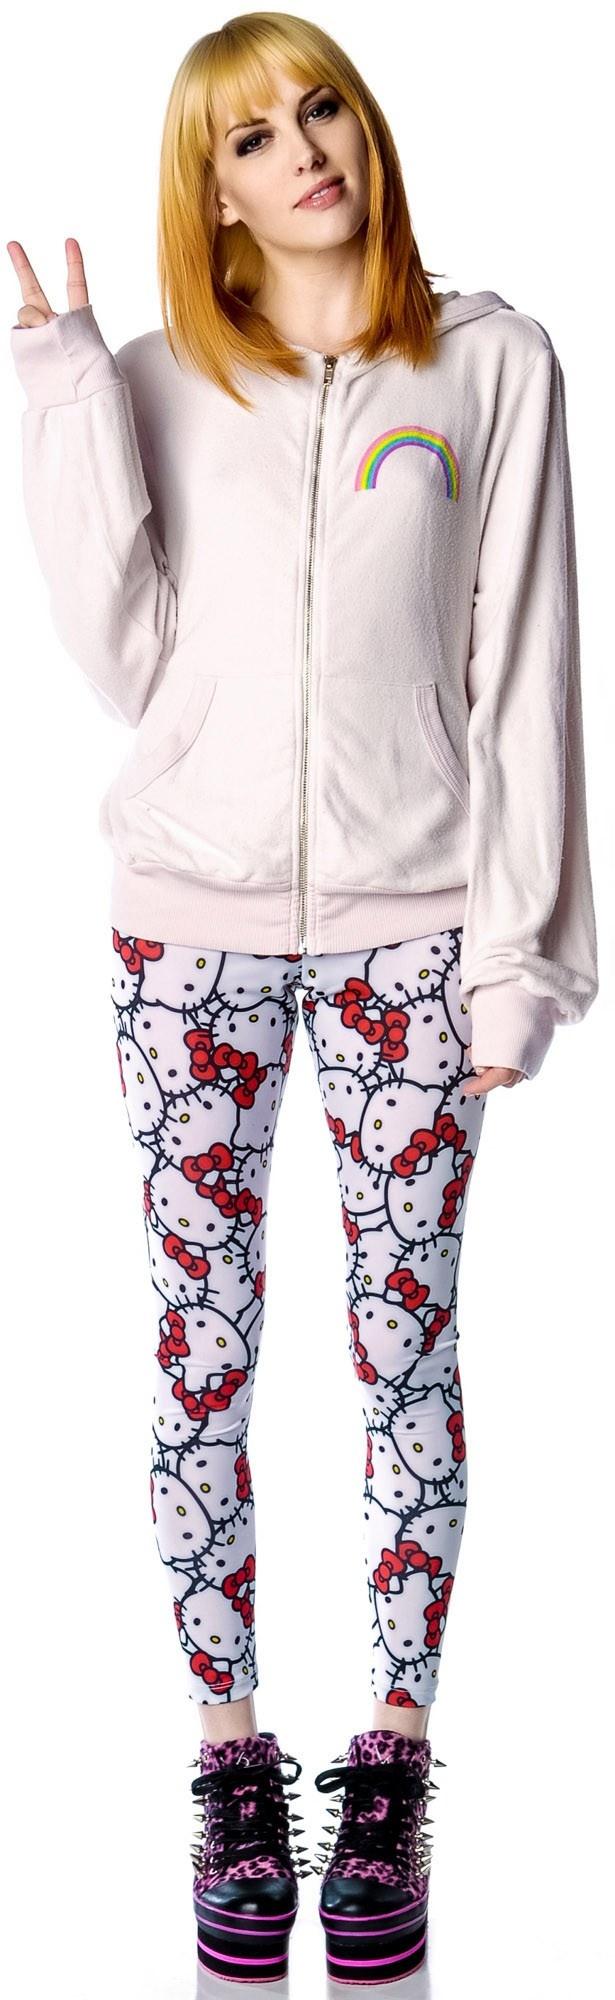 JapanLA x Hello Kitty Classic Leggings available at http://dollskill.com